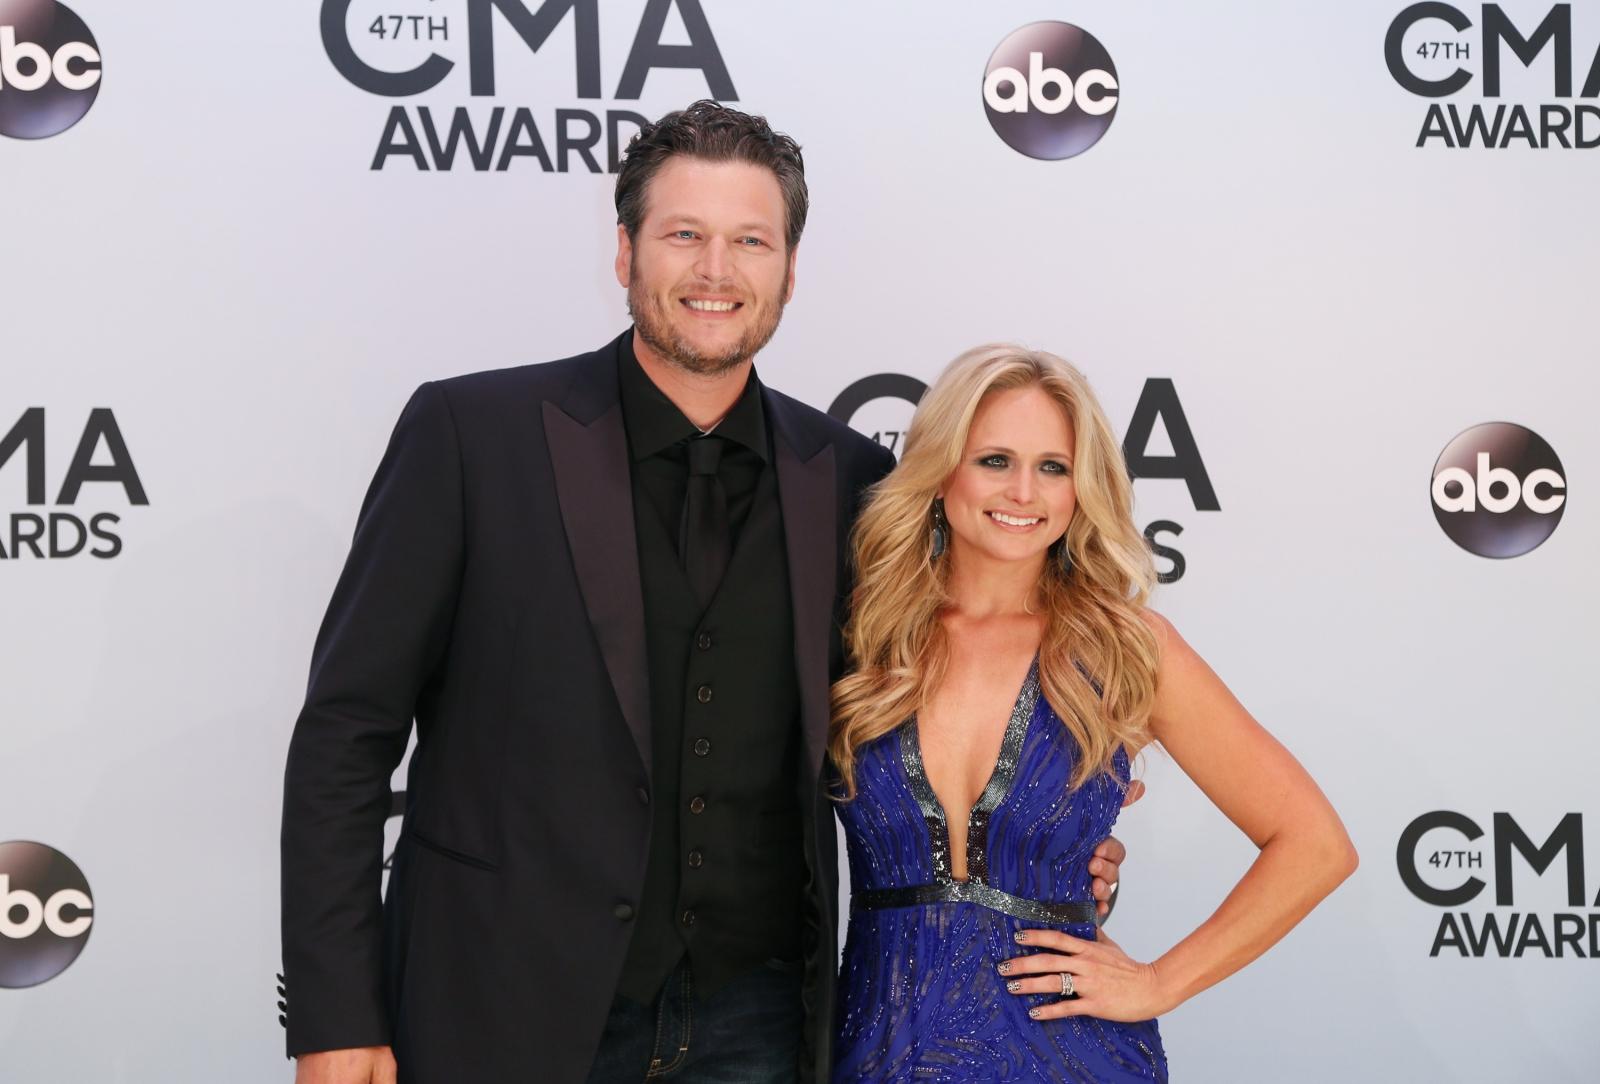 Is Blake Shelton Married